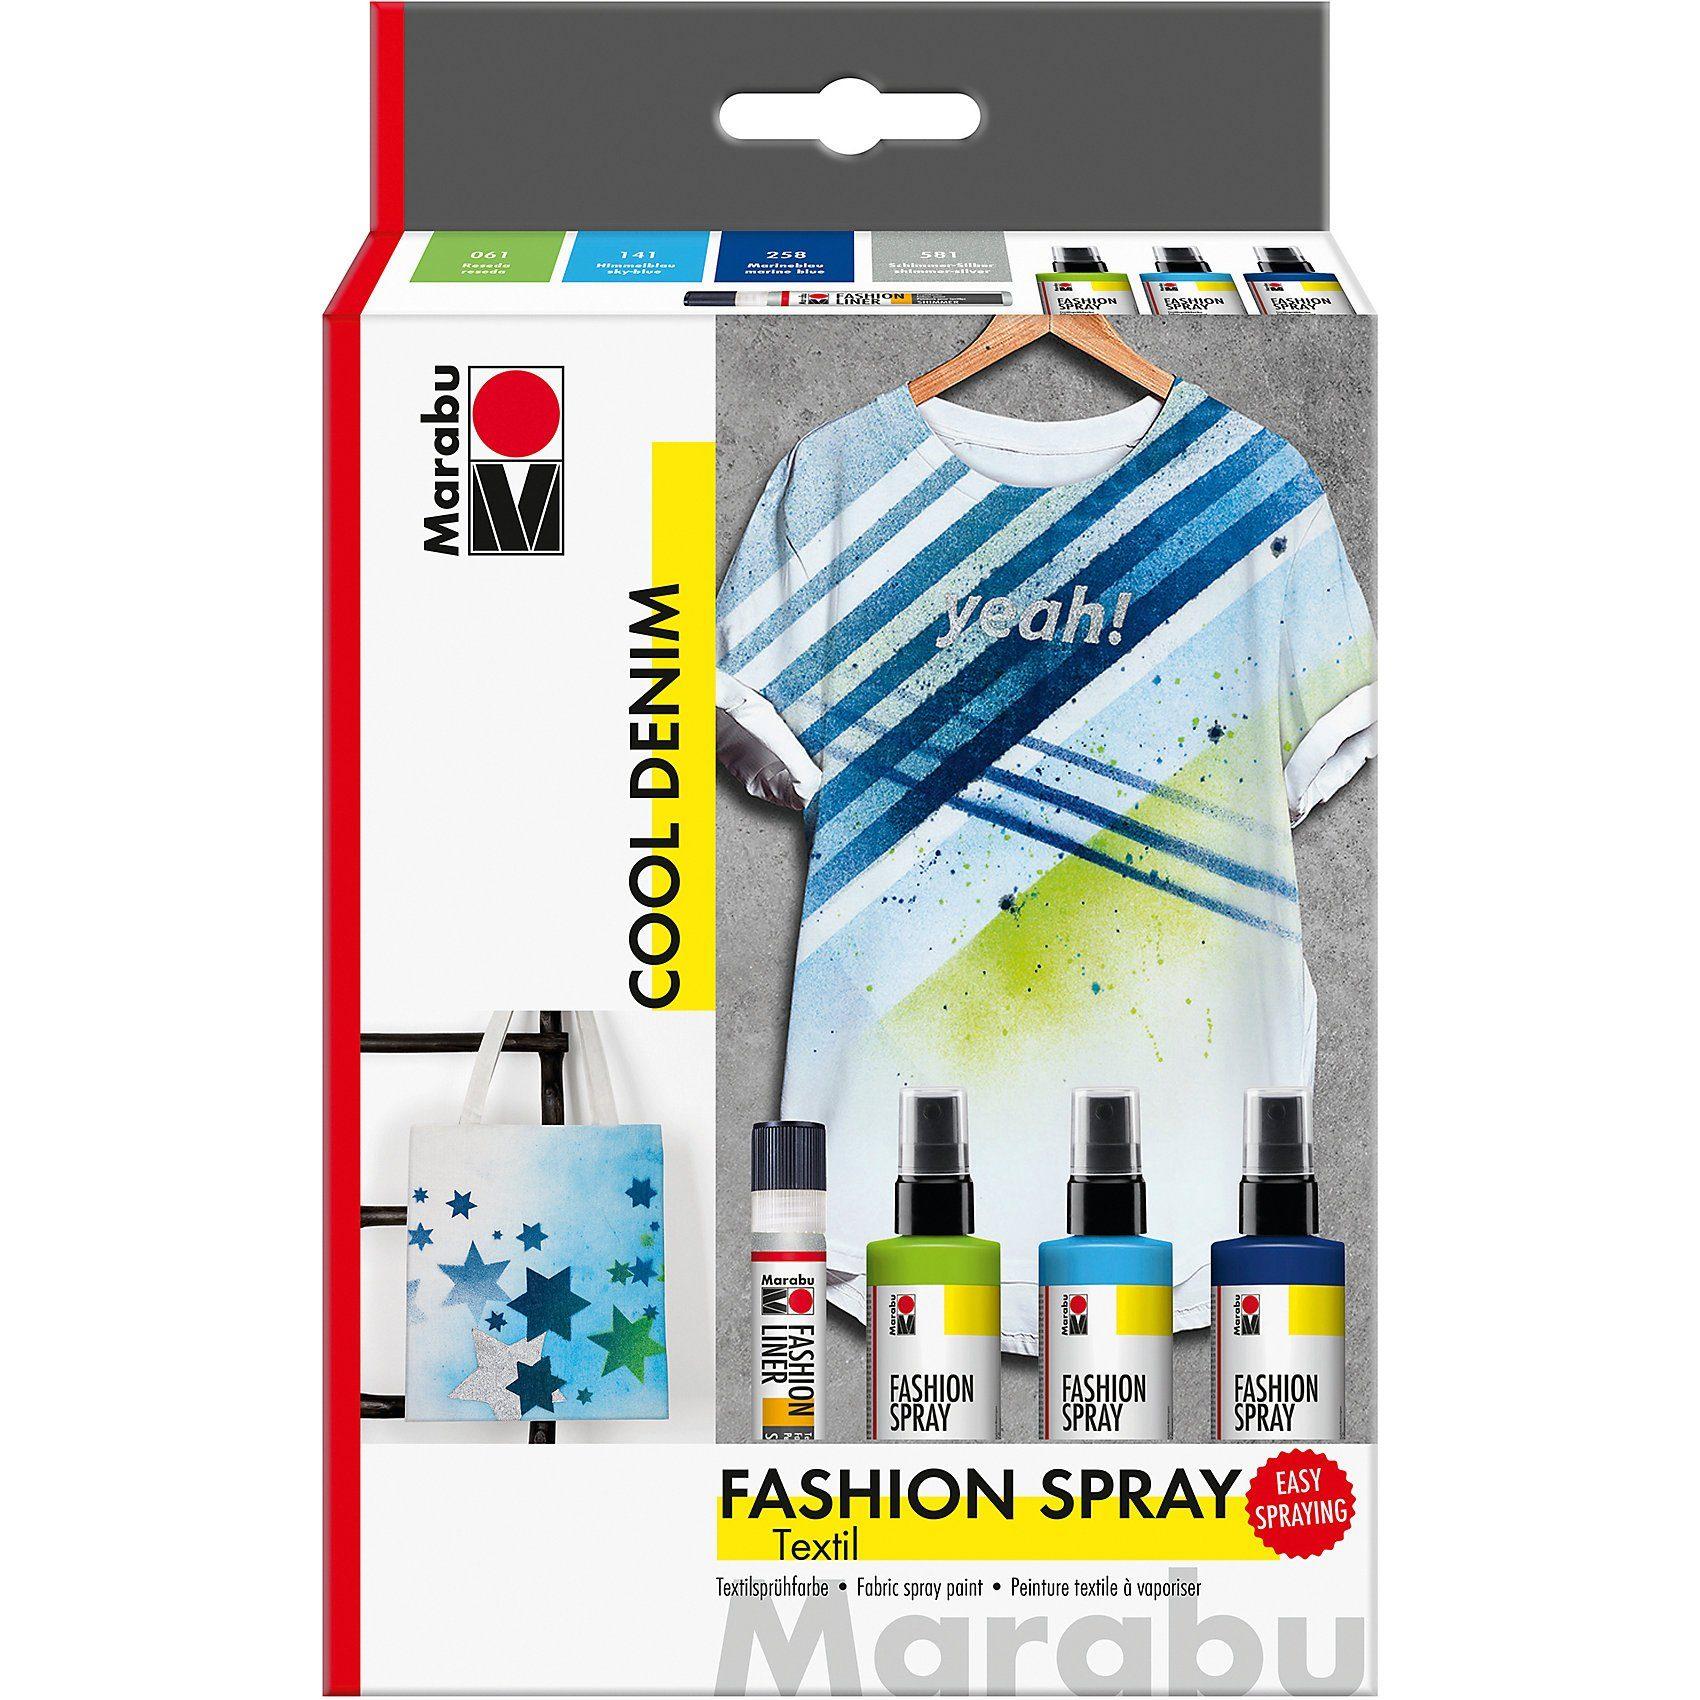 Marabu Fashion-Spray Cool Denim Textilsprühfarbe